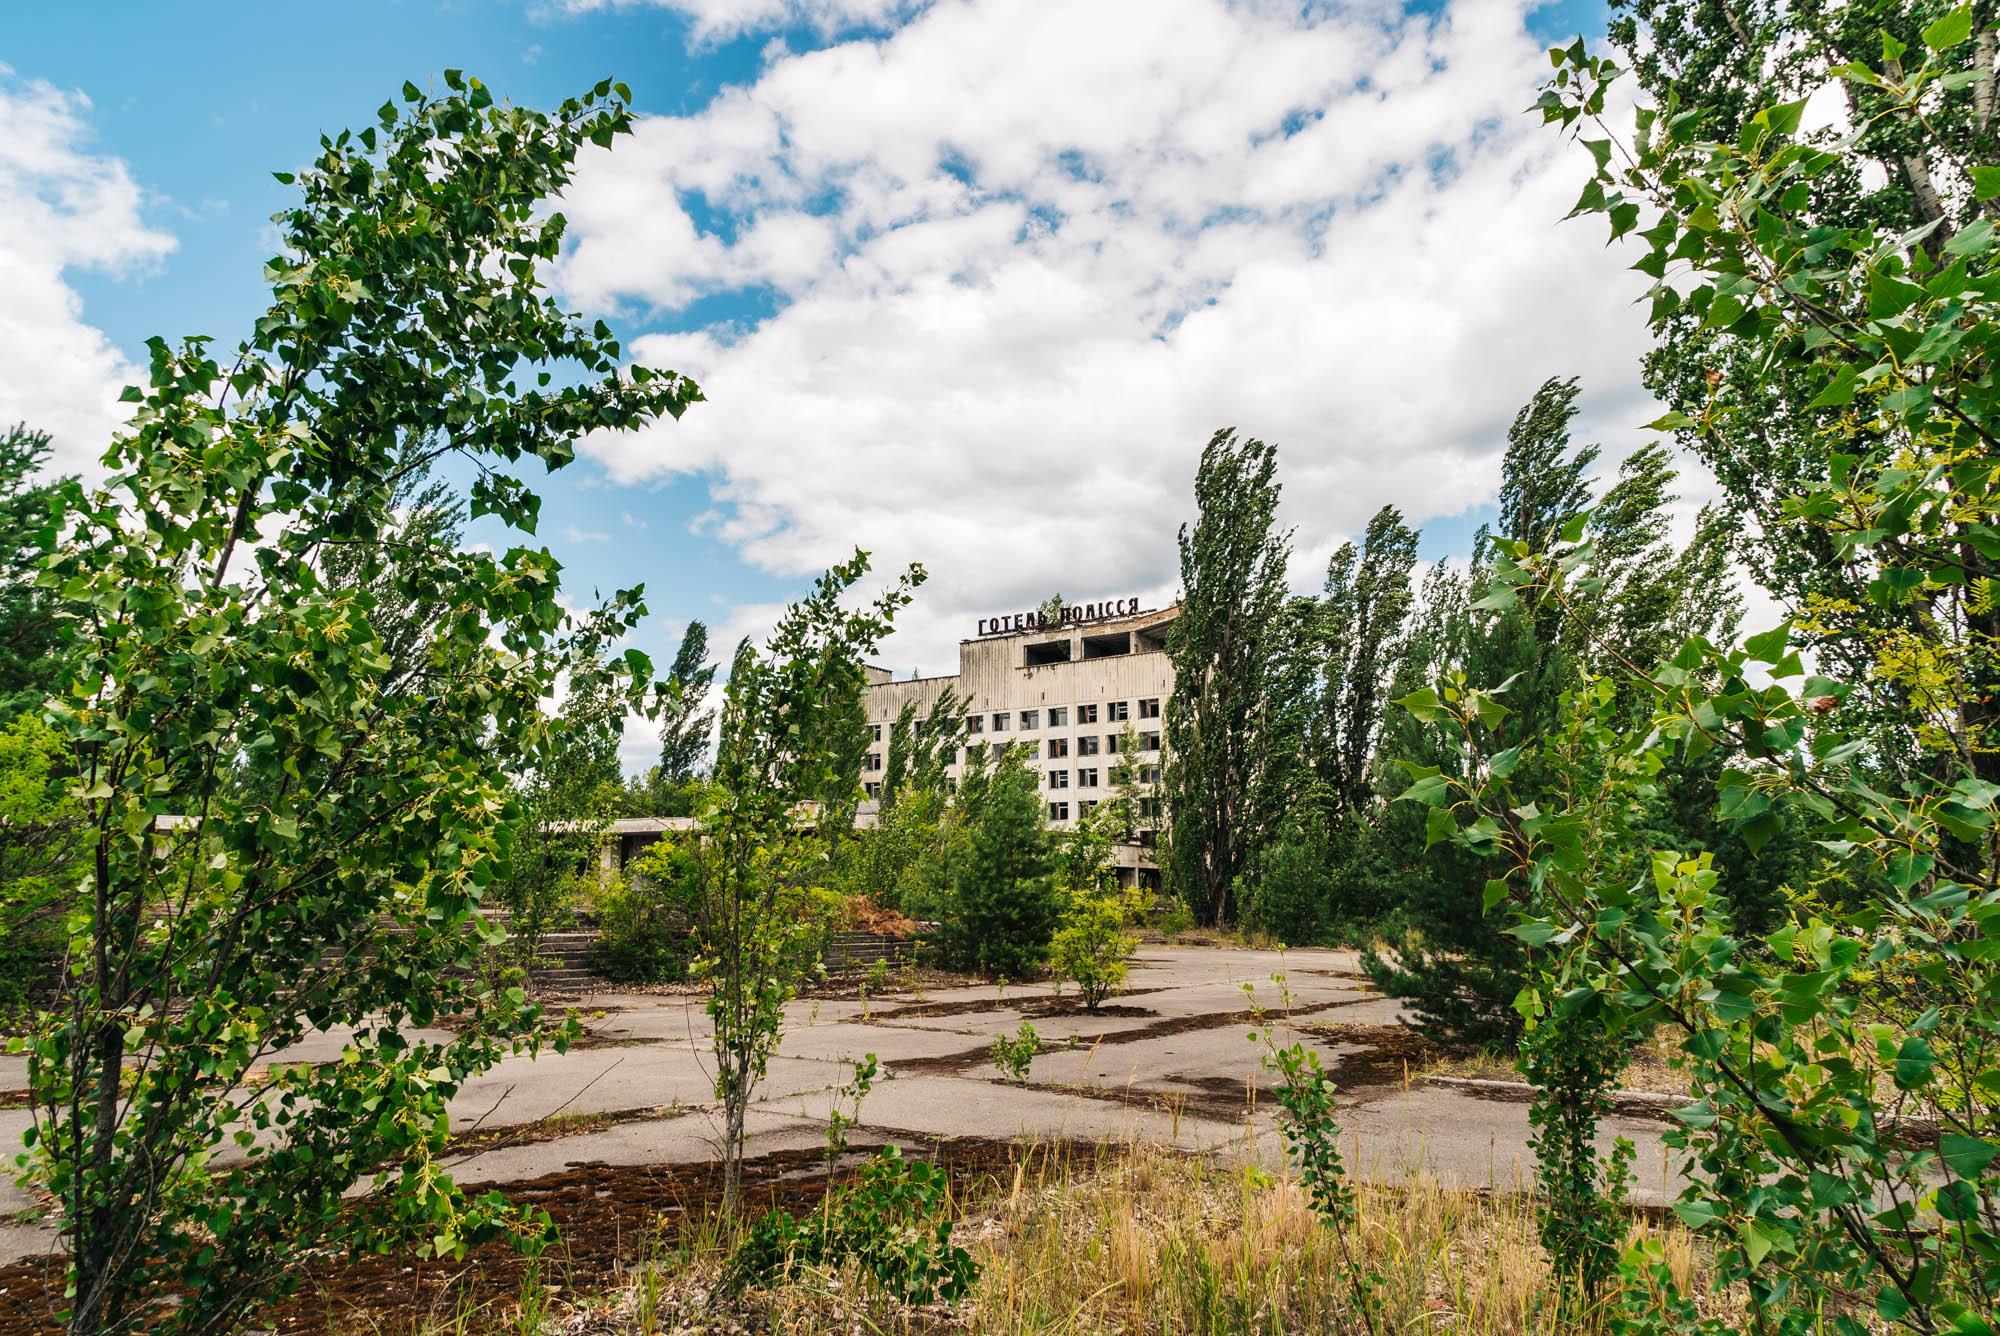 Pripyat, The abandoned city